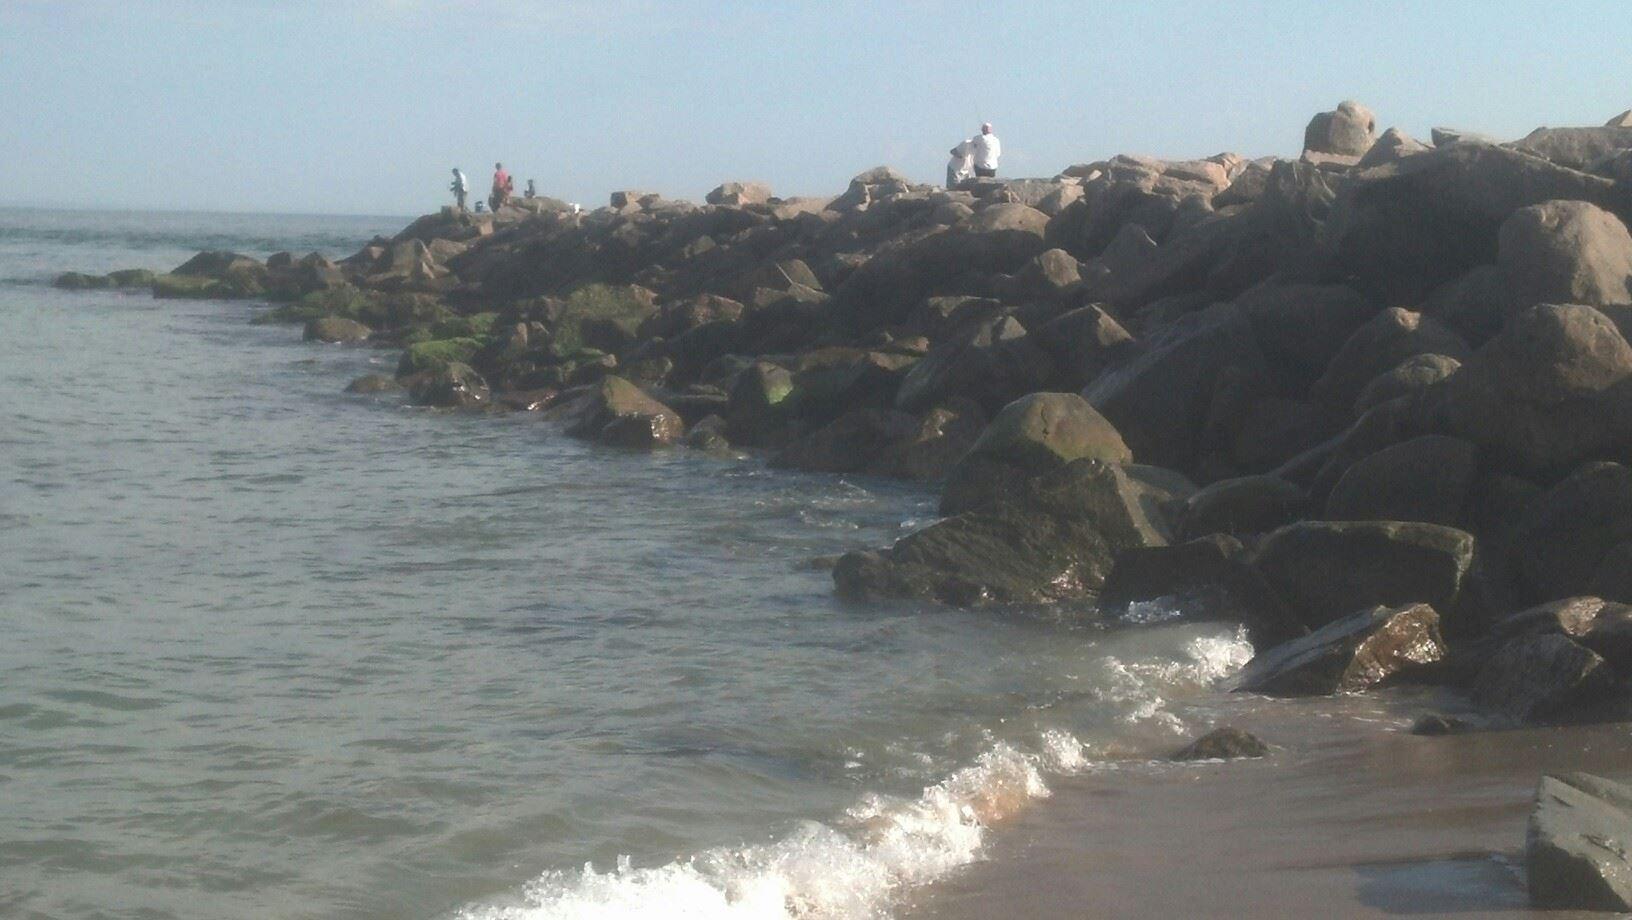 Charlestown, Rhode Island Breach way (photo by Meghan)